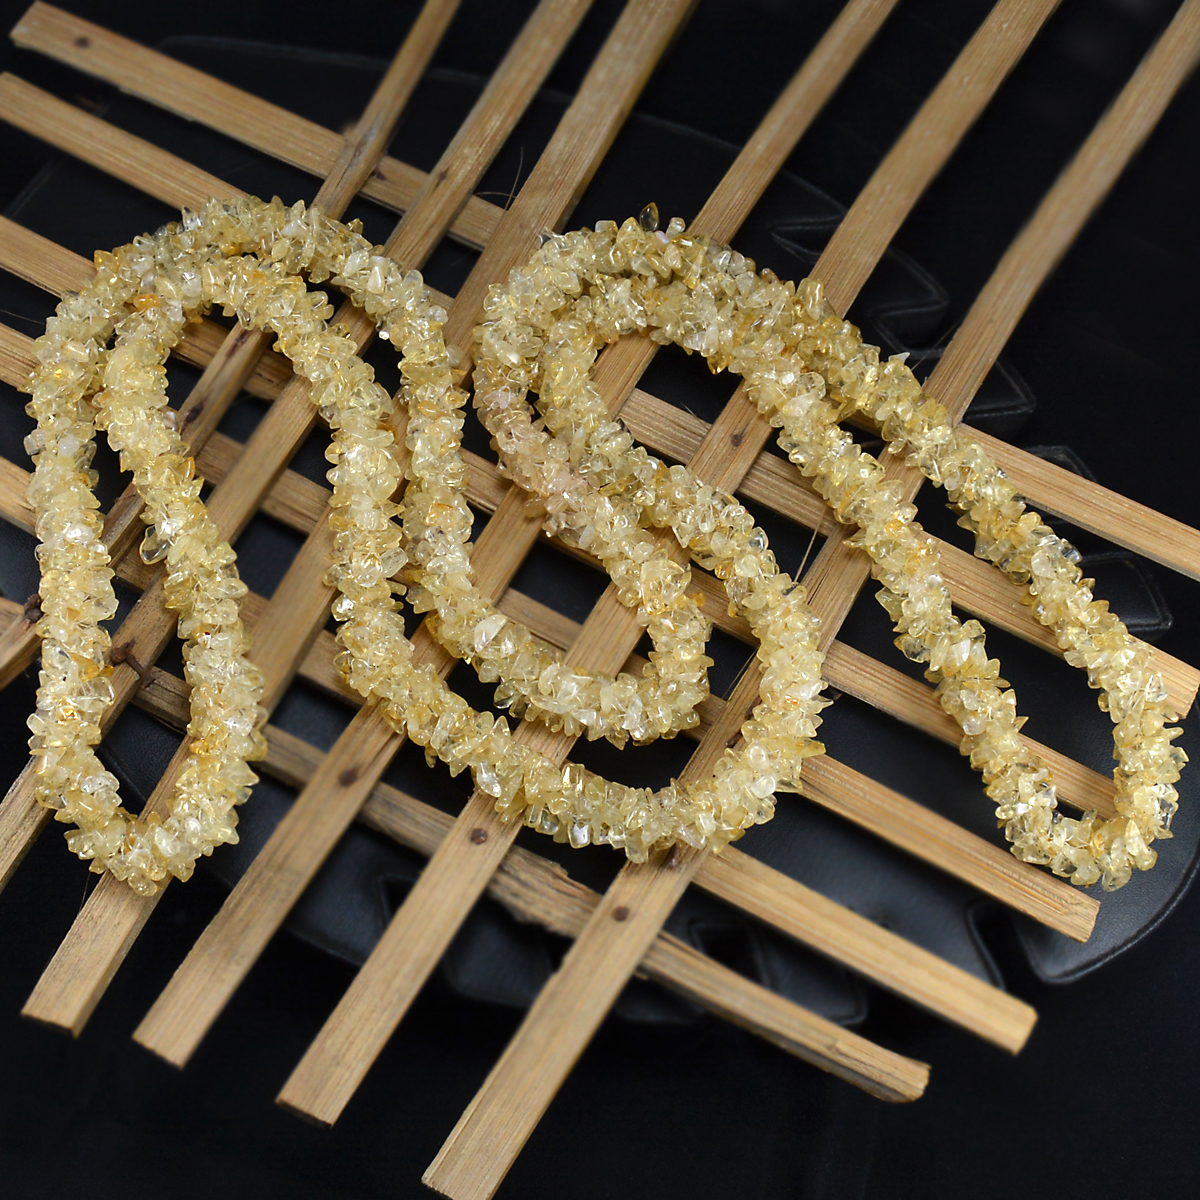 Citrine Gemstone Chips Necklace PG-156072